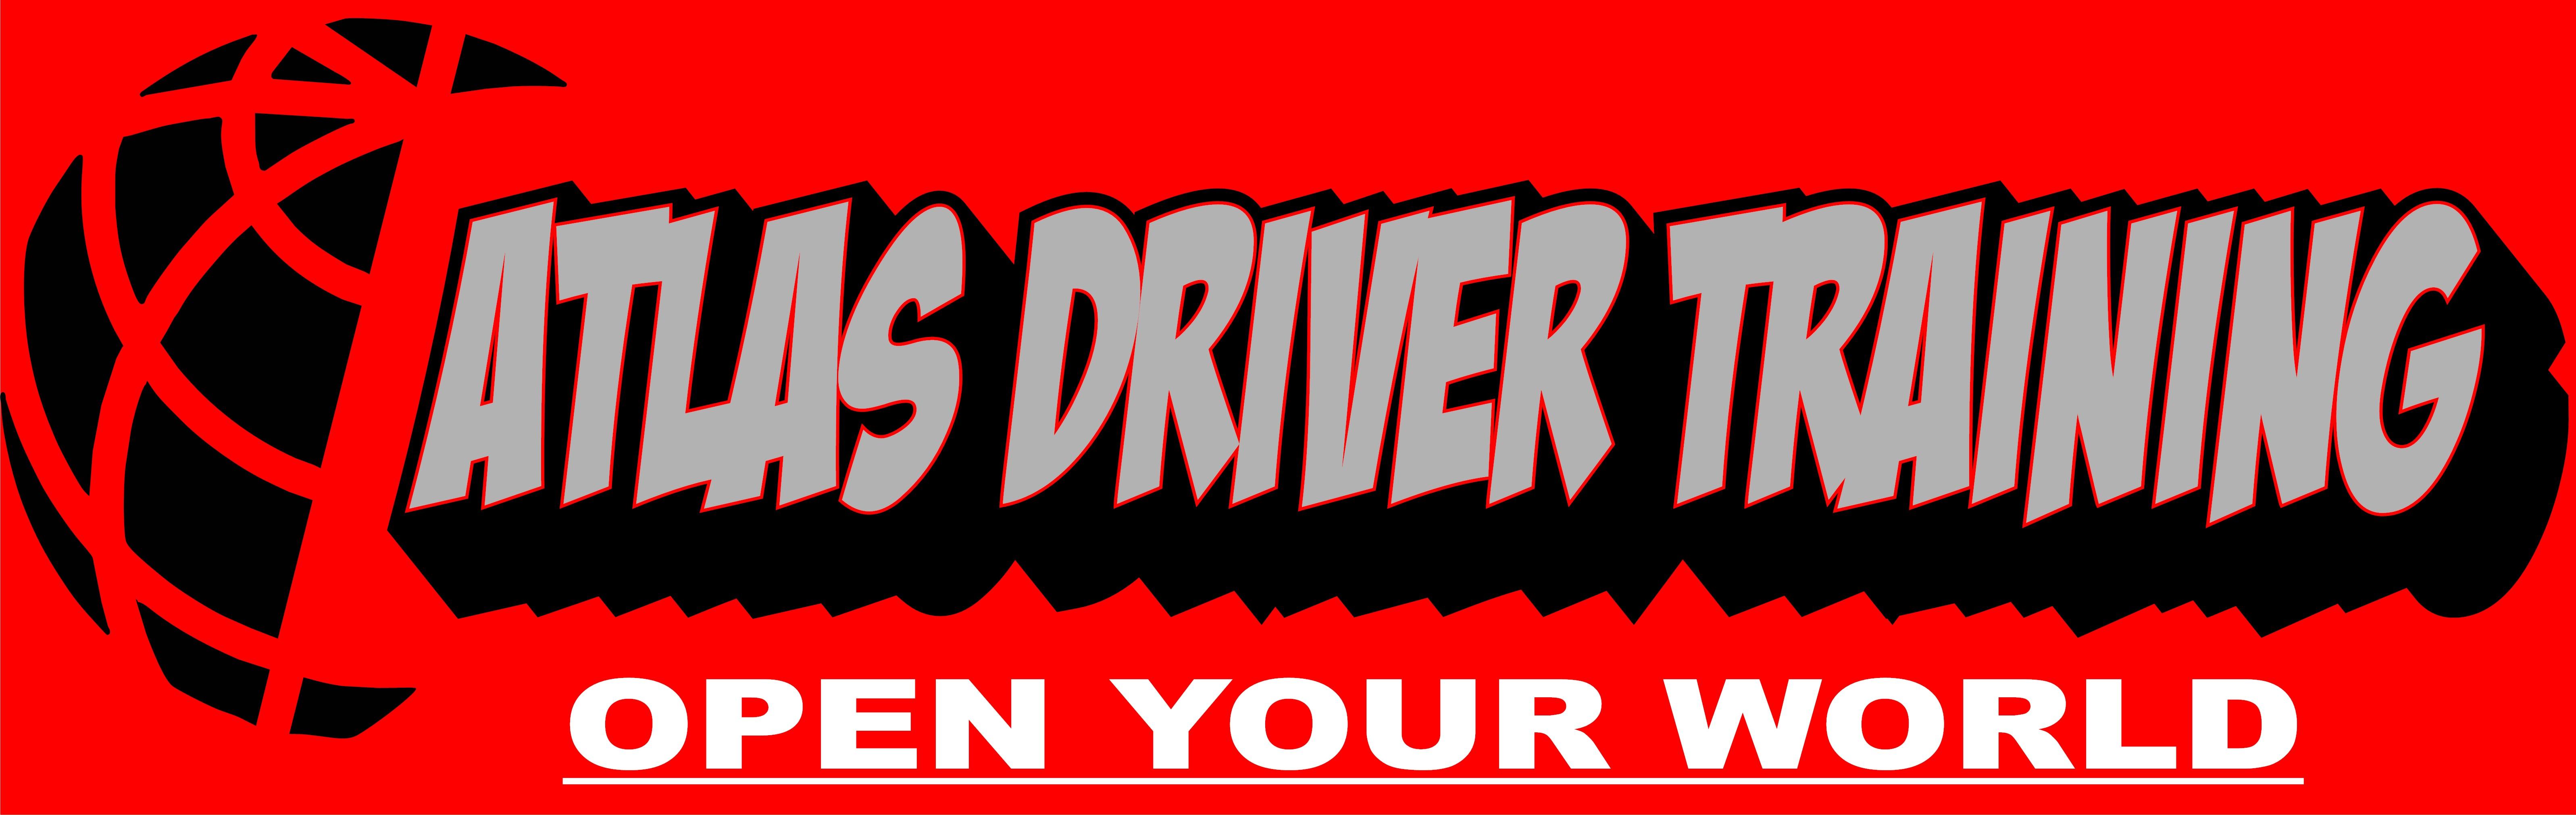 Atlas Driver Training